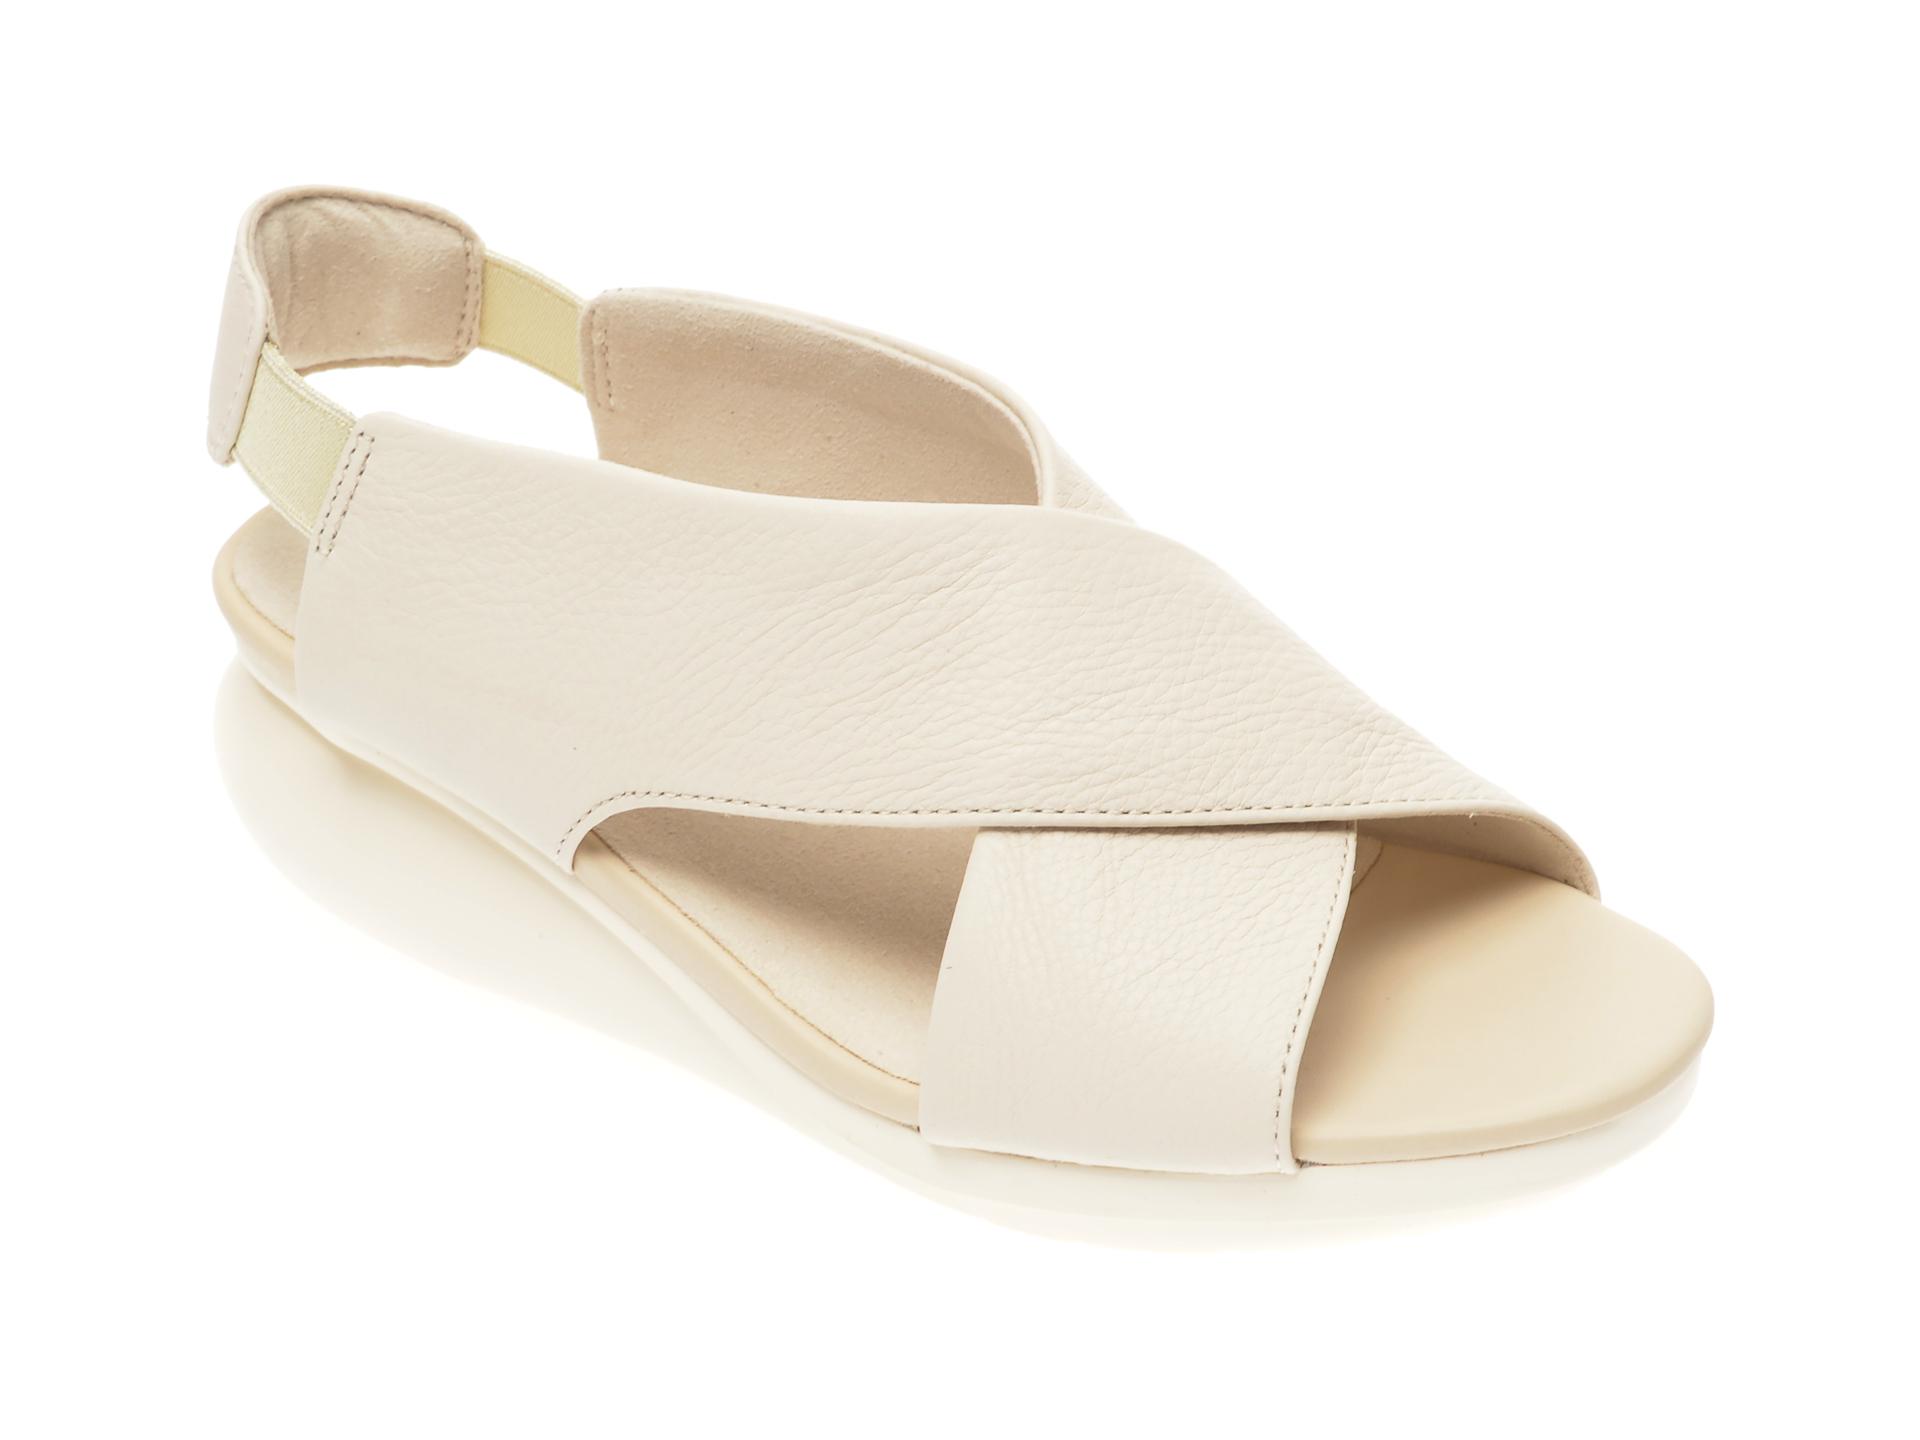 Sandale CAMPER albe, K200066, din piele naturala imagine